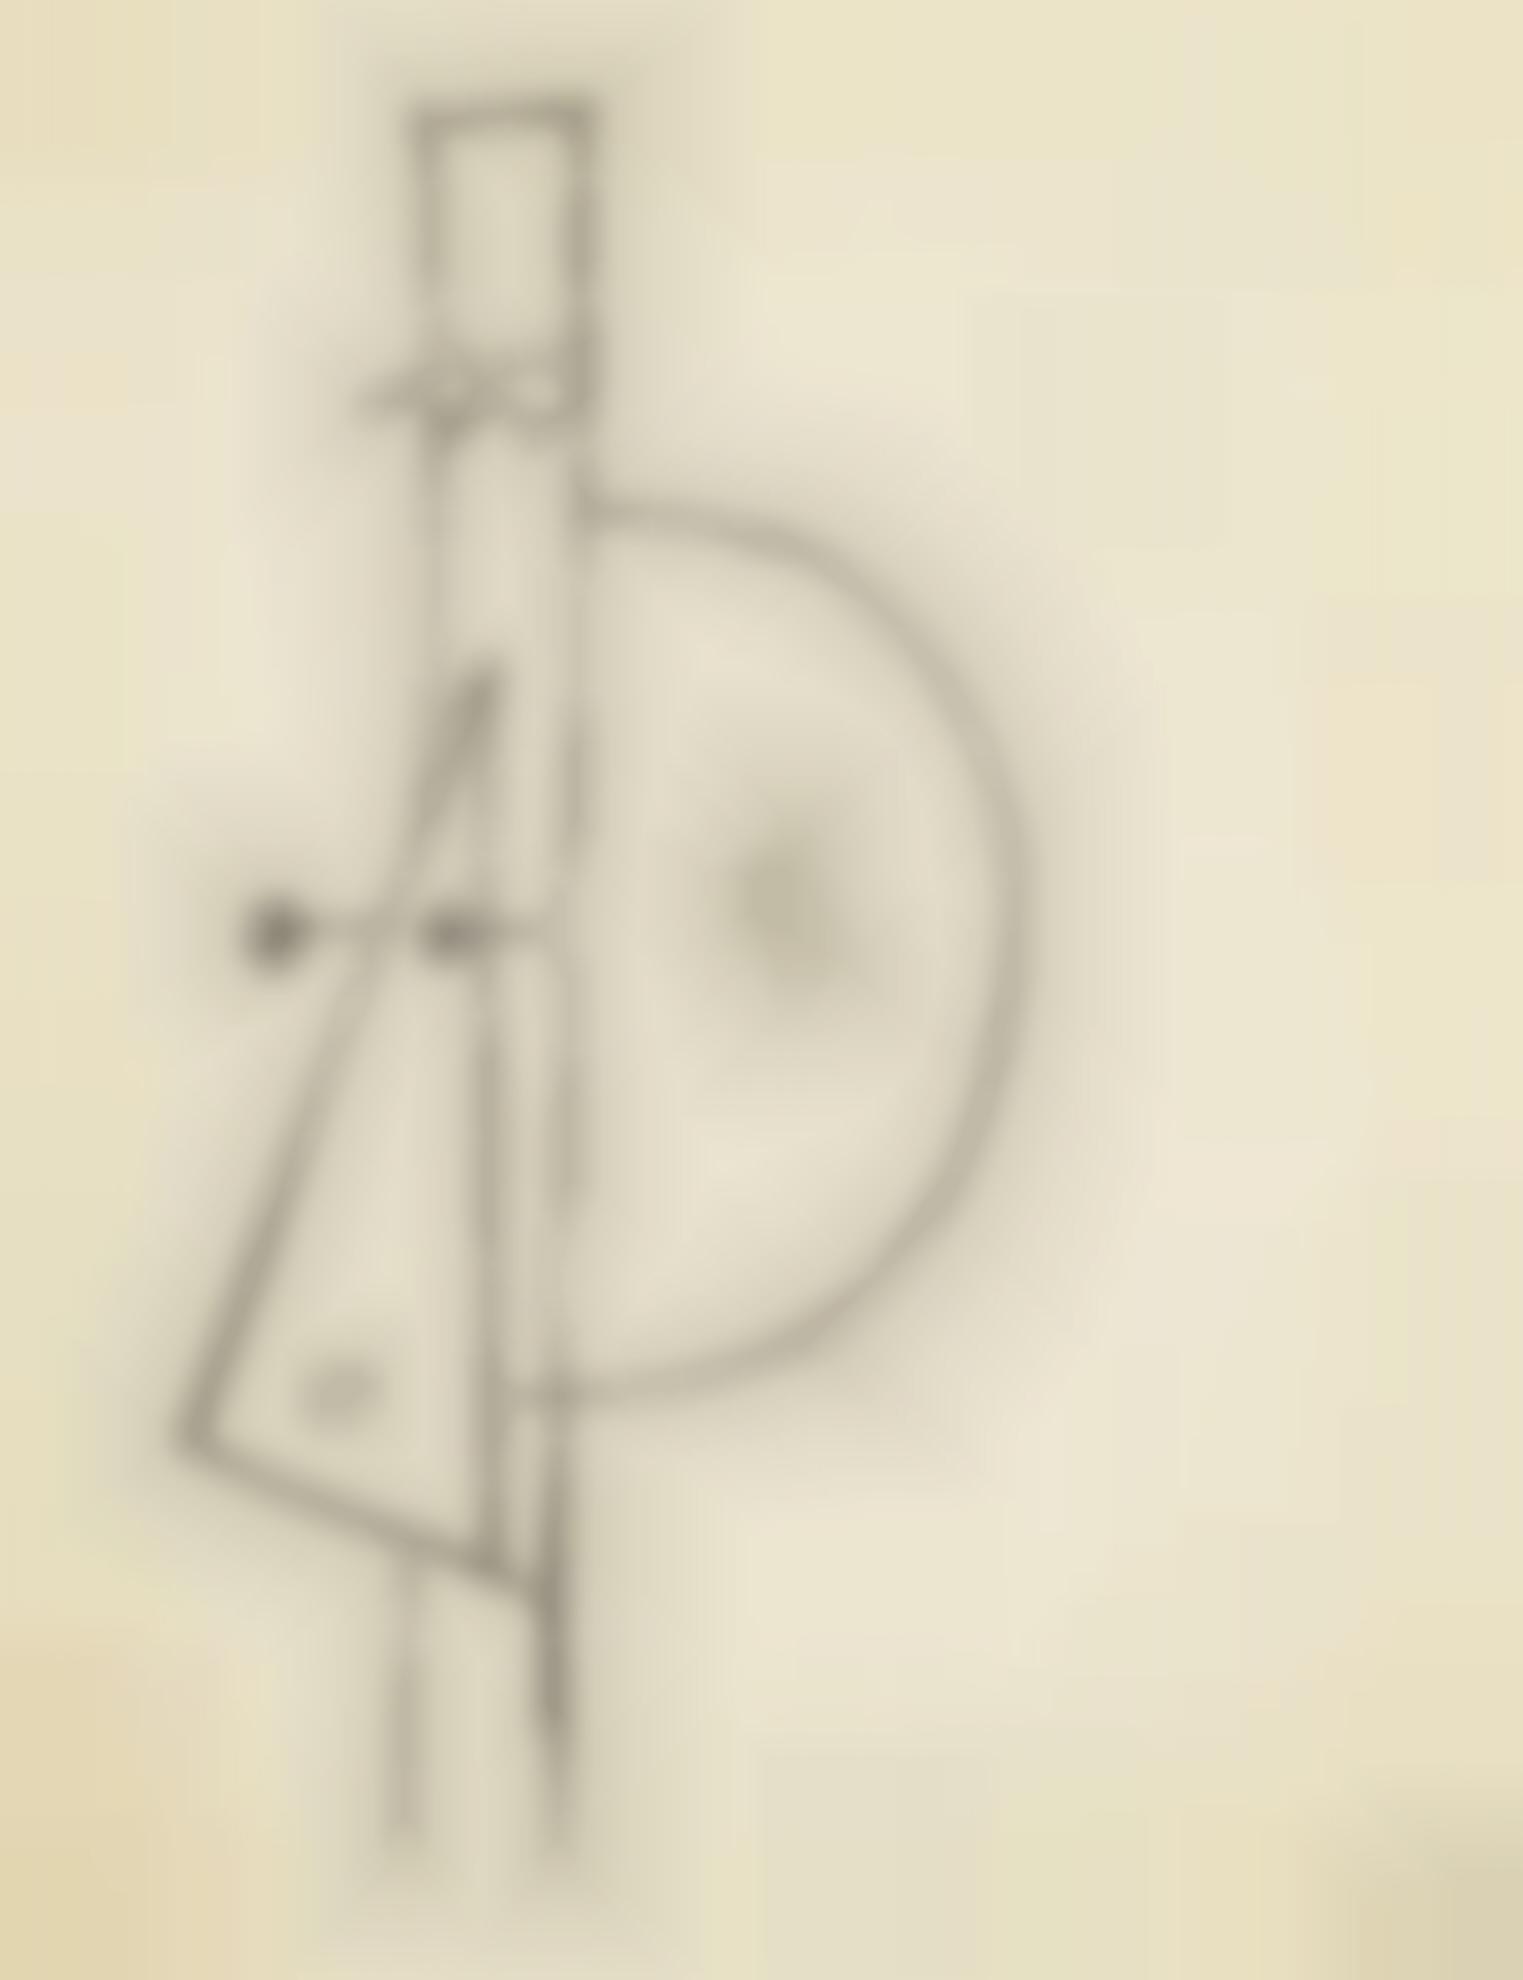 Pablo Picasso-Visage-1913